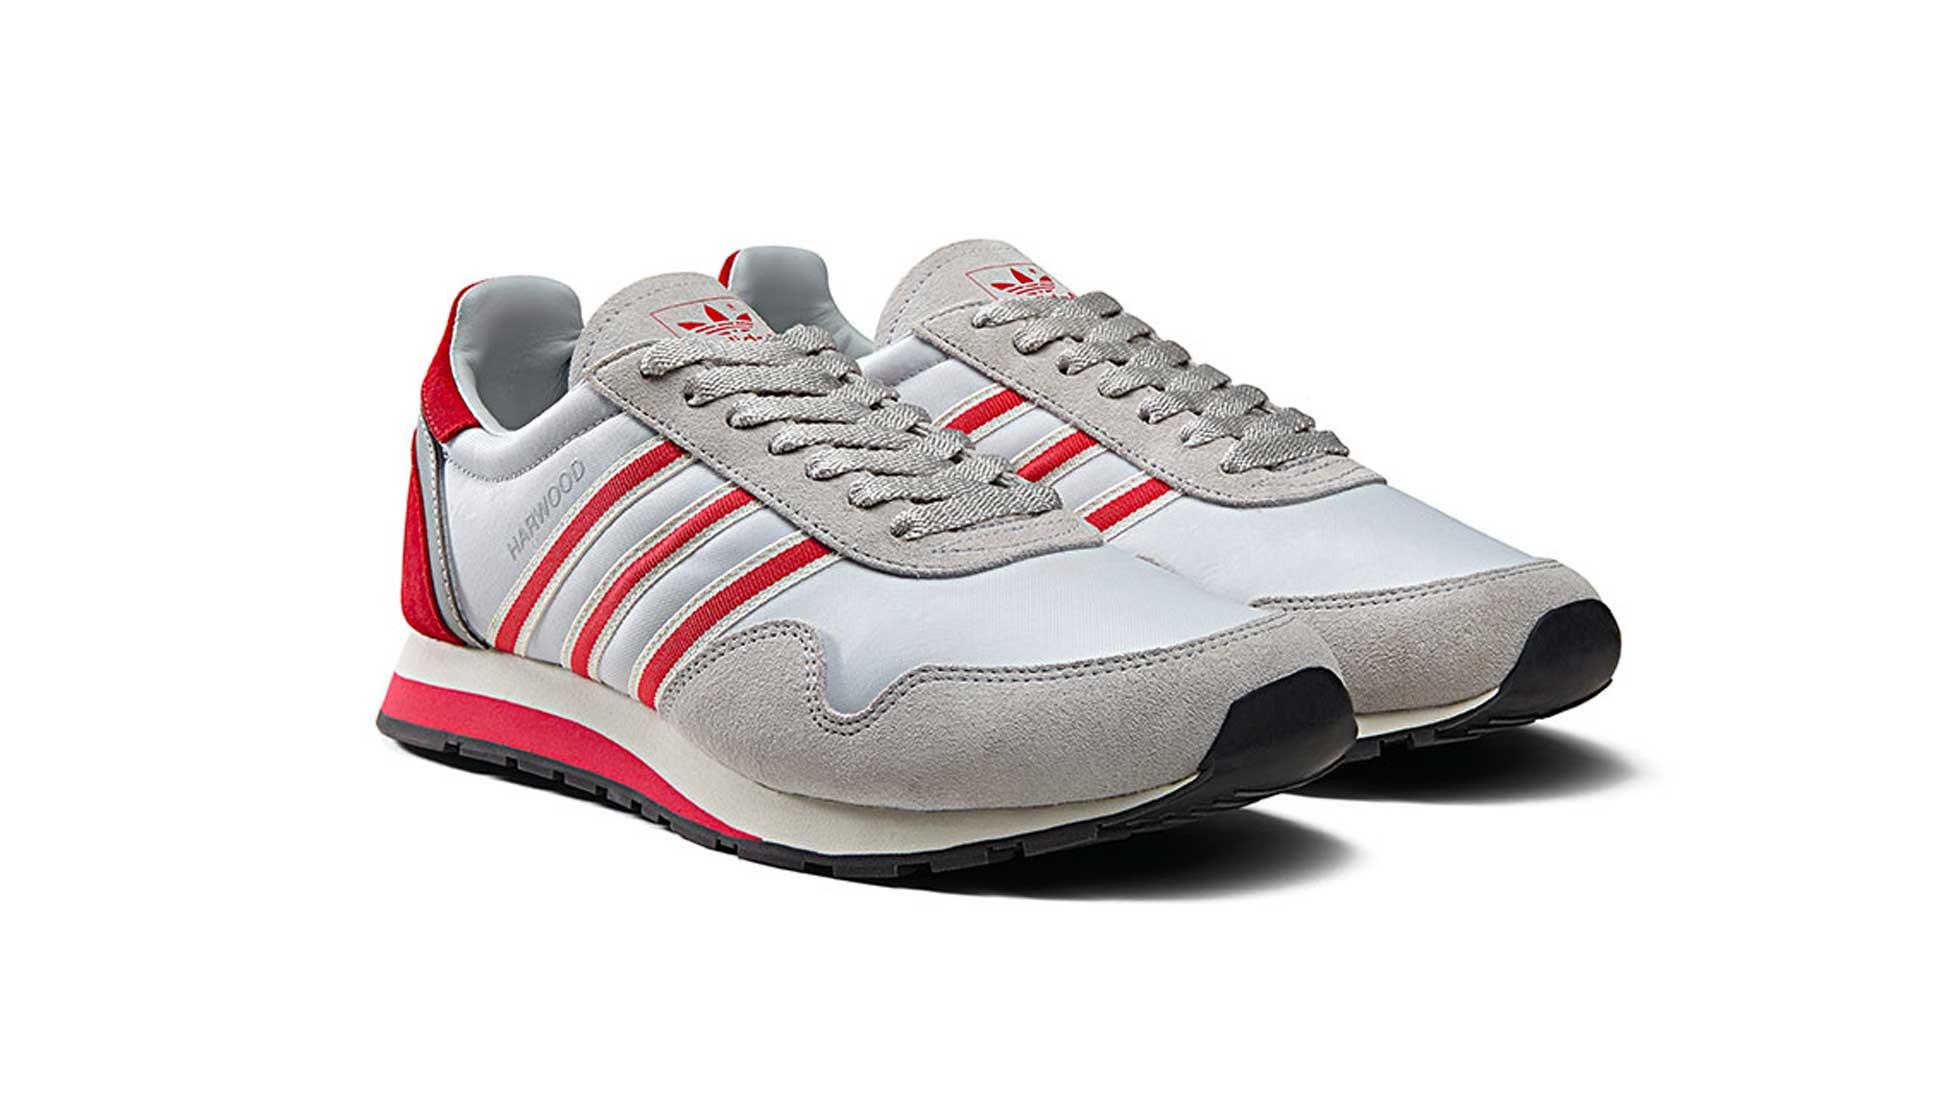 adidas unveil SPEZIAL AW16 Footwear Collection - SoccerBible. 79b8e361636de